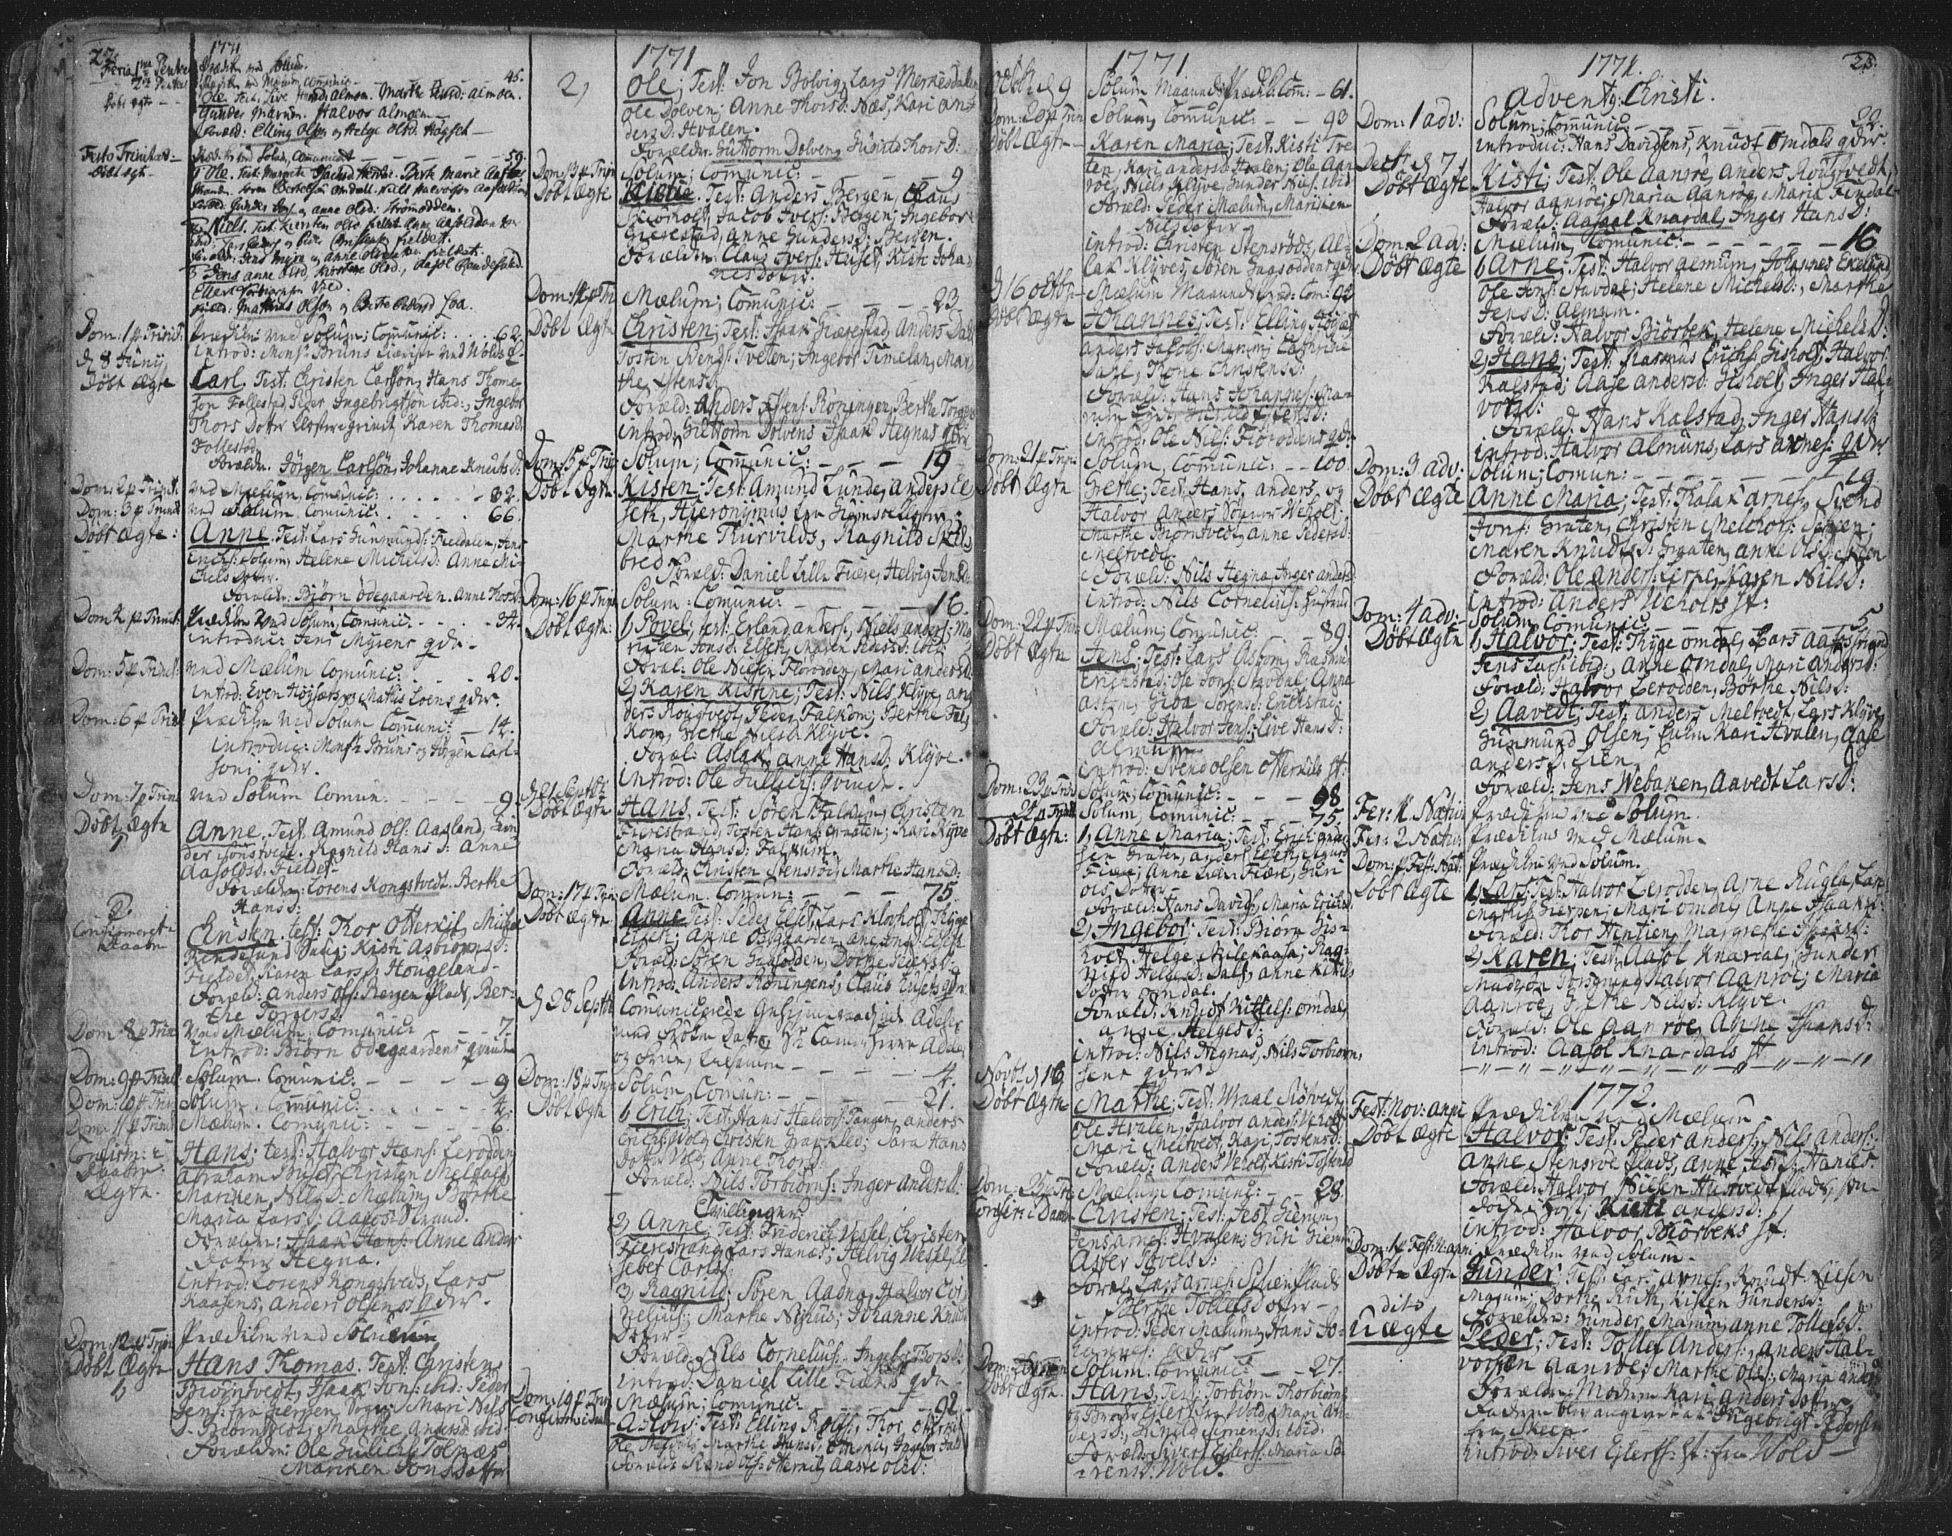 SAKO, Solum kirkebøker, F/Fa/L0003: Ministerialbok nr. I 3, 1761-1814, s. 22-23